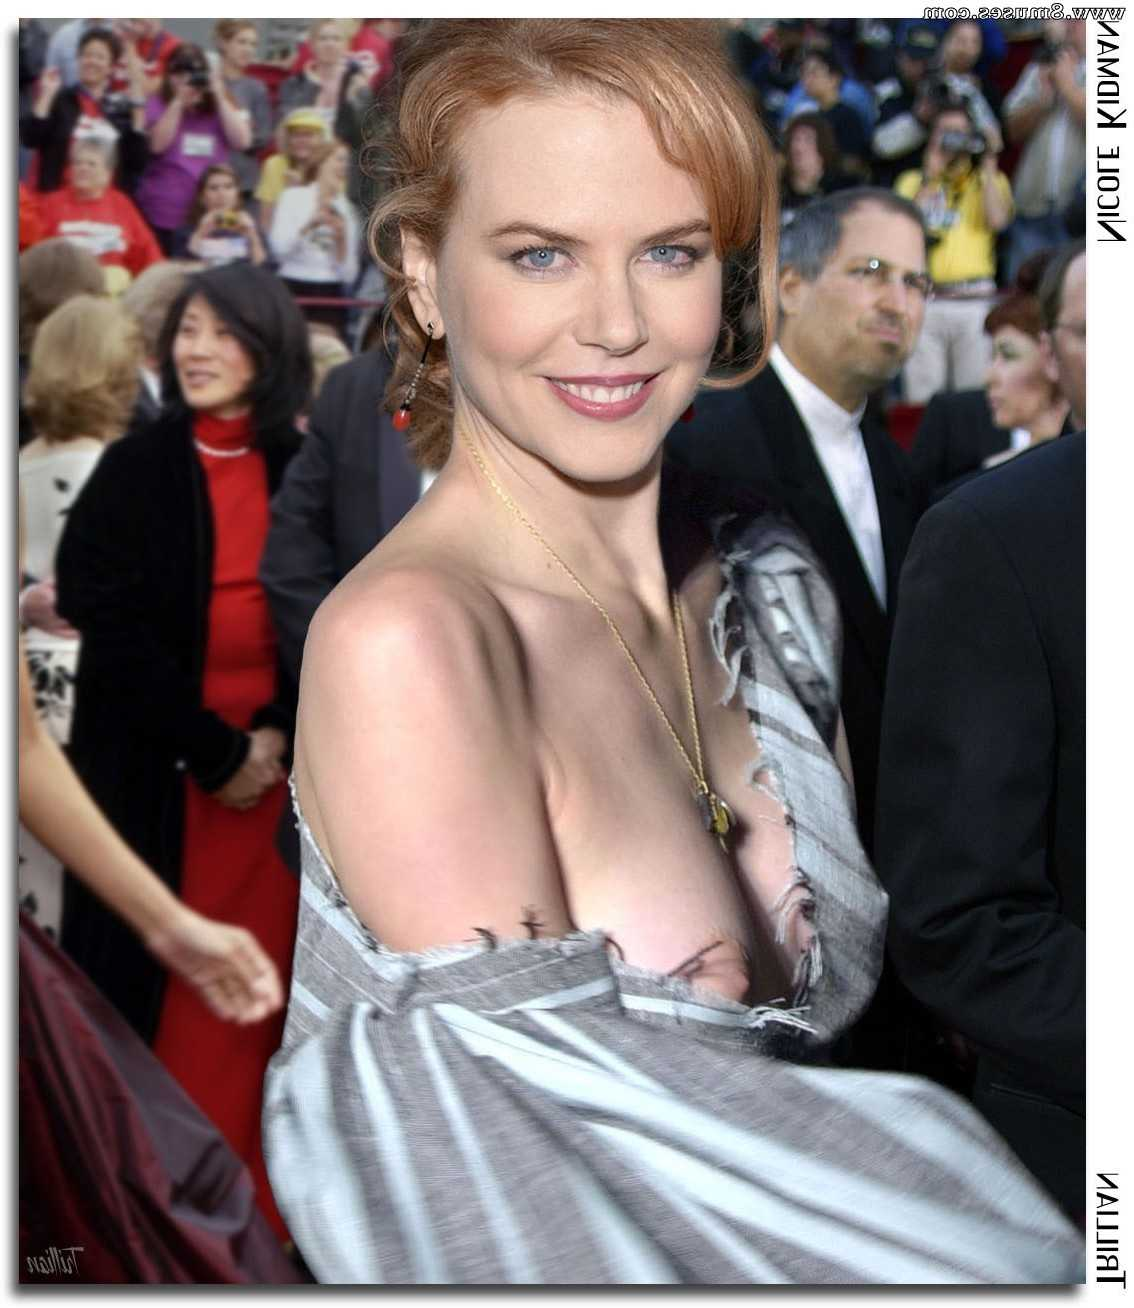 Fake-Celebrities-Sex-Pictures/Nicole-Kidman Nicole_Kidman__8muses_-_Sex_and_Porn_Comics_1030.jpg